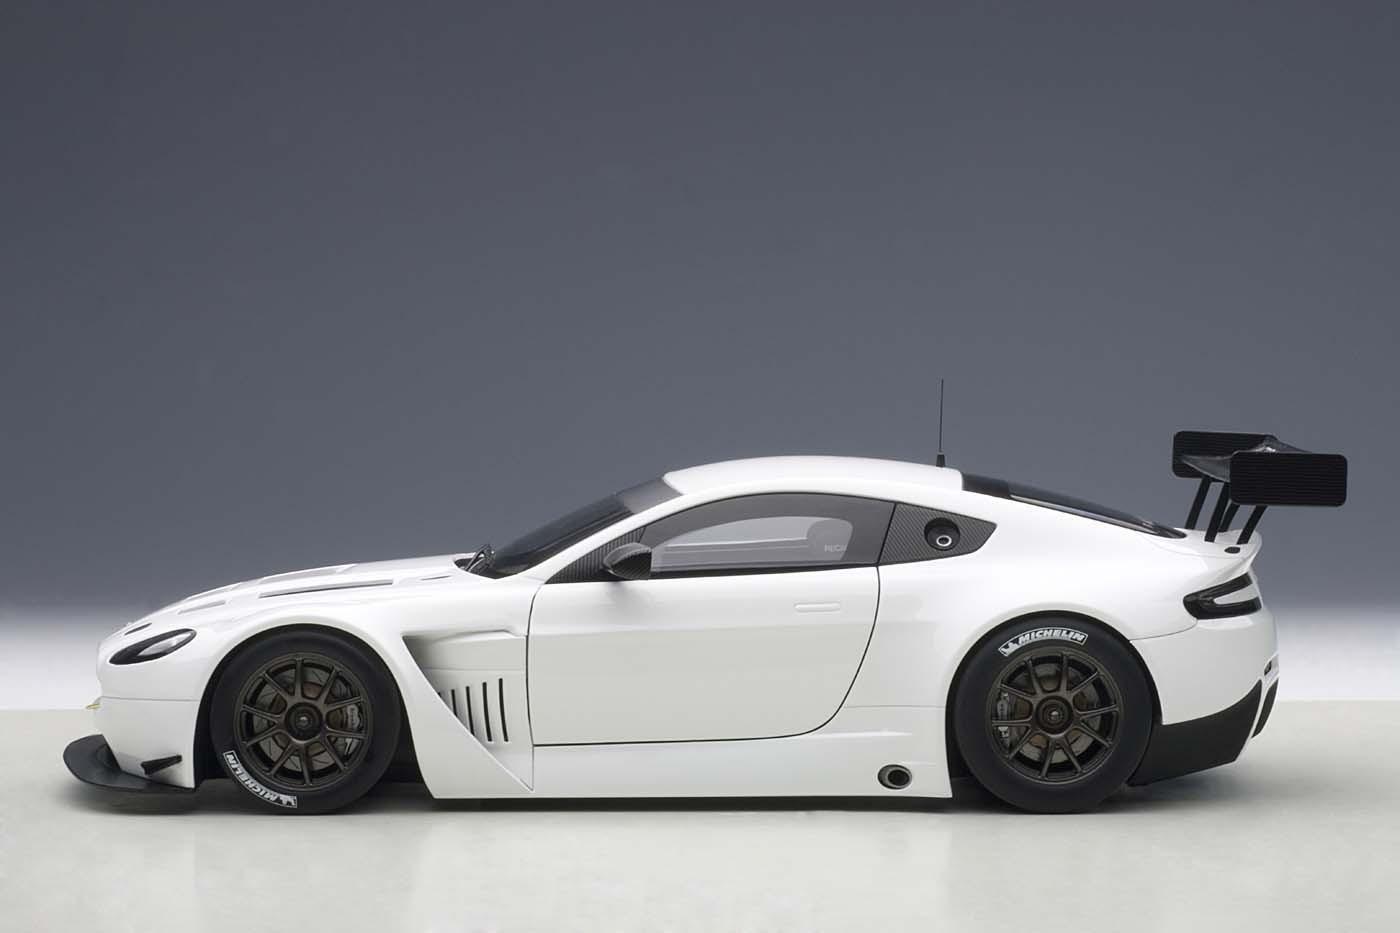 highly detailed autoart diecast model car white aston martin